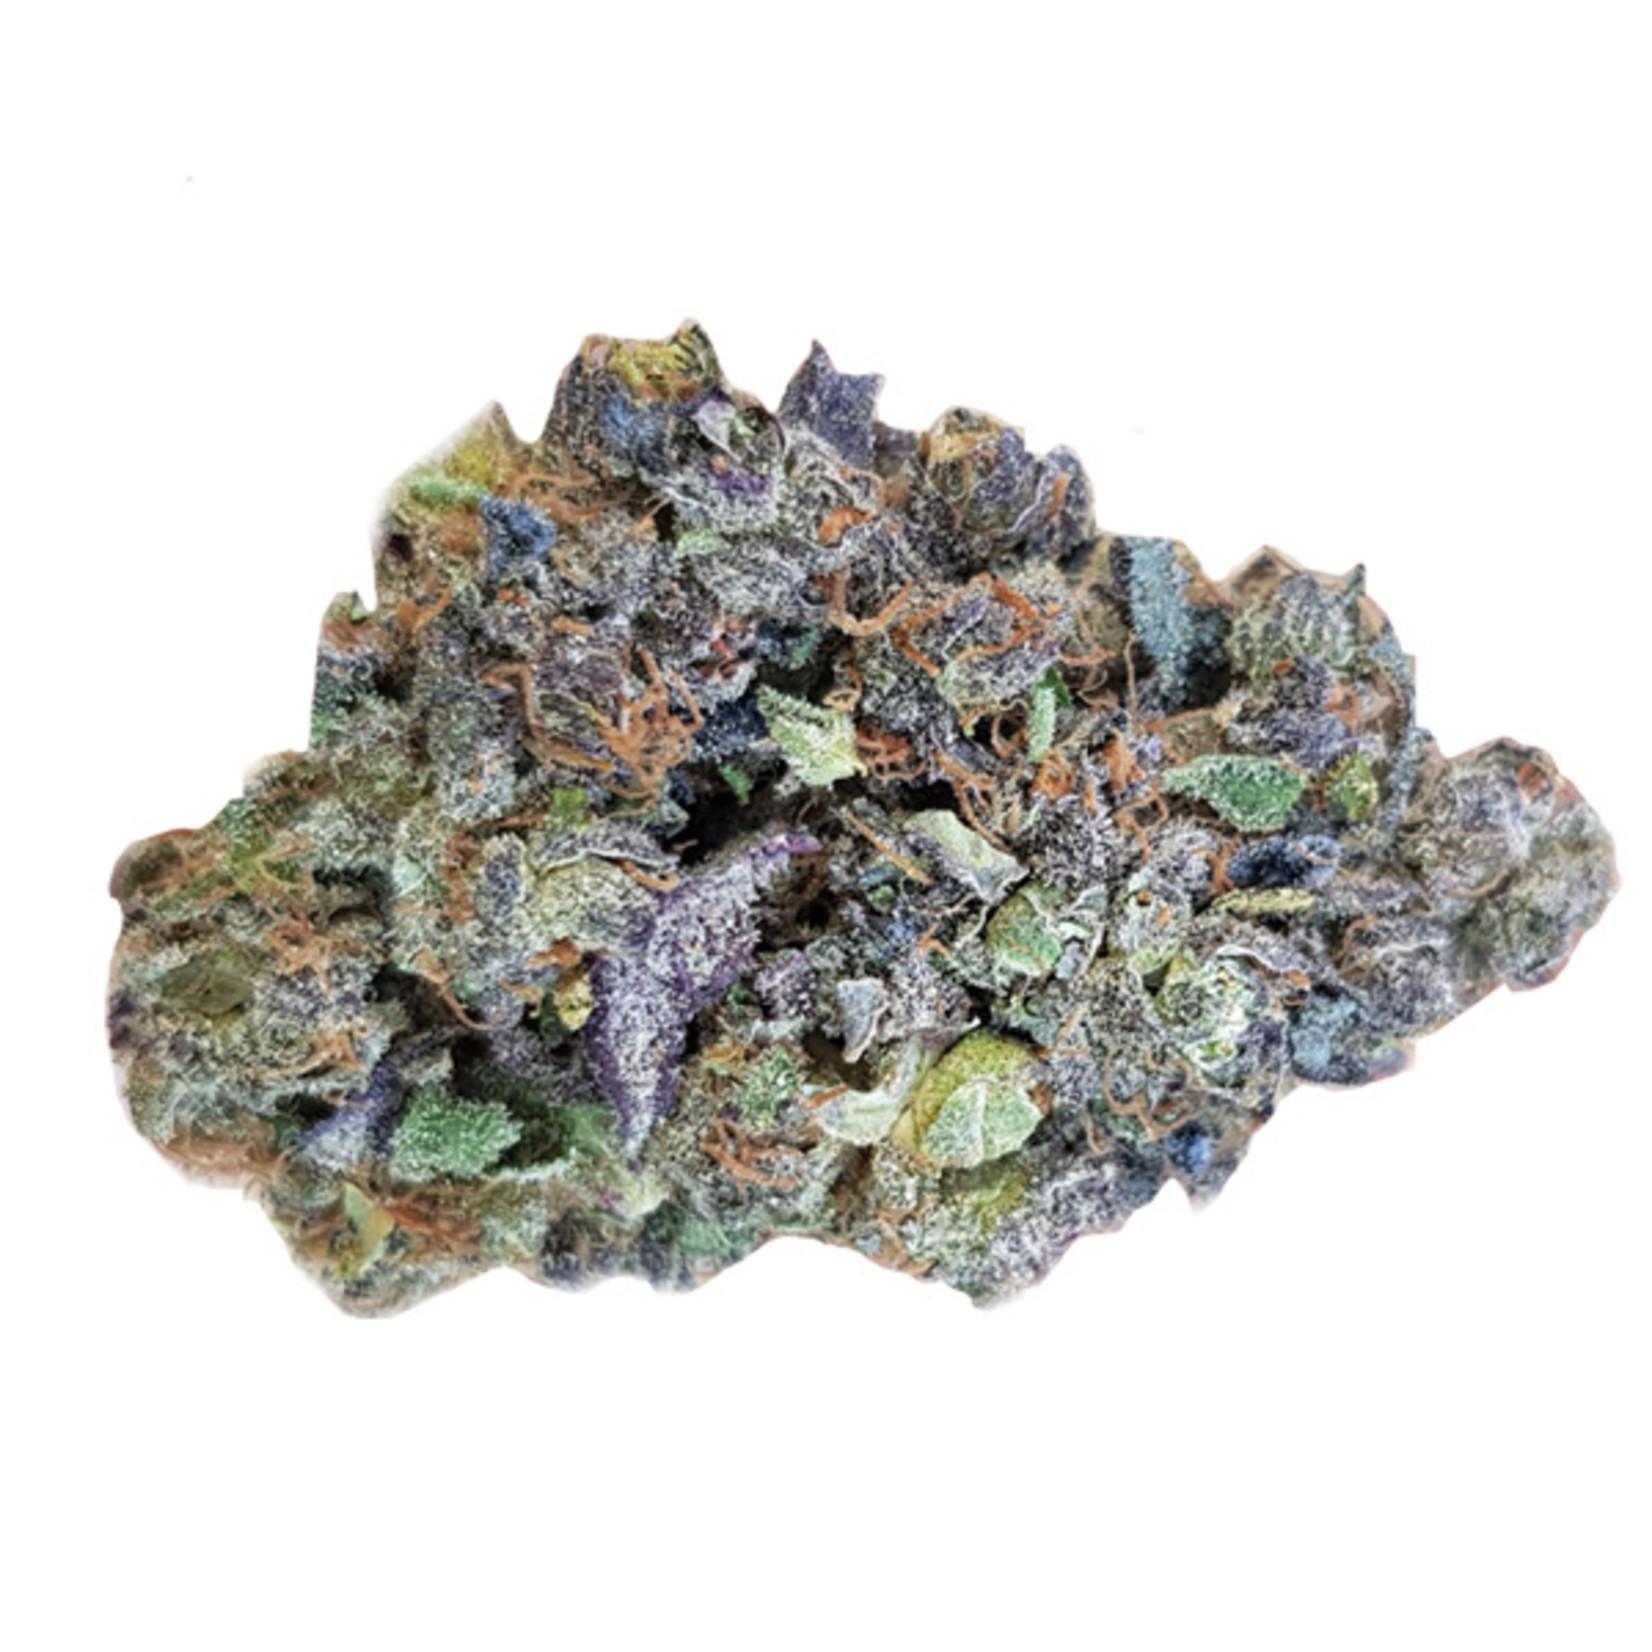 Dolato cannabis seeds